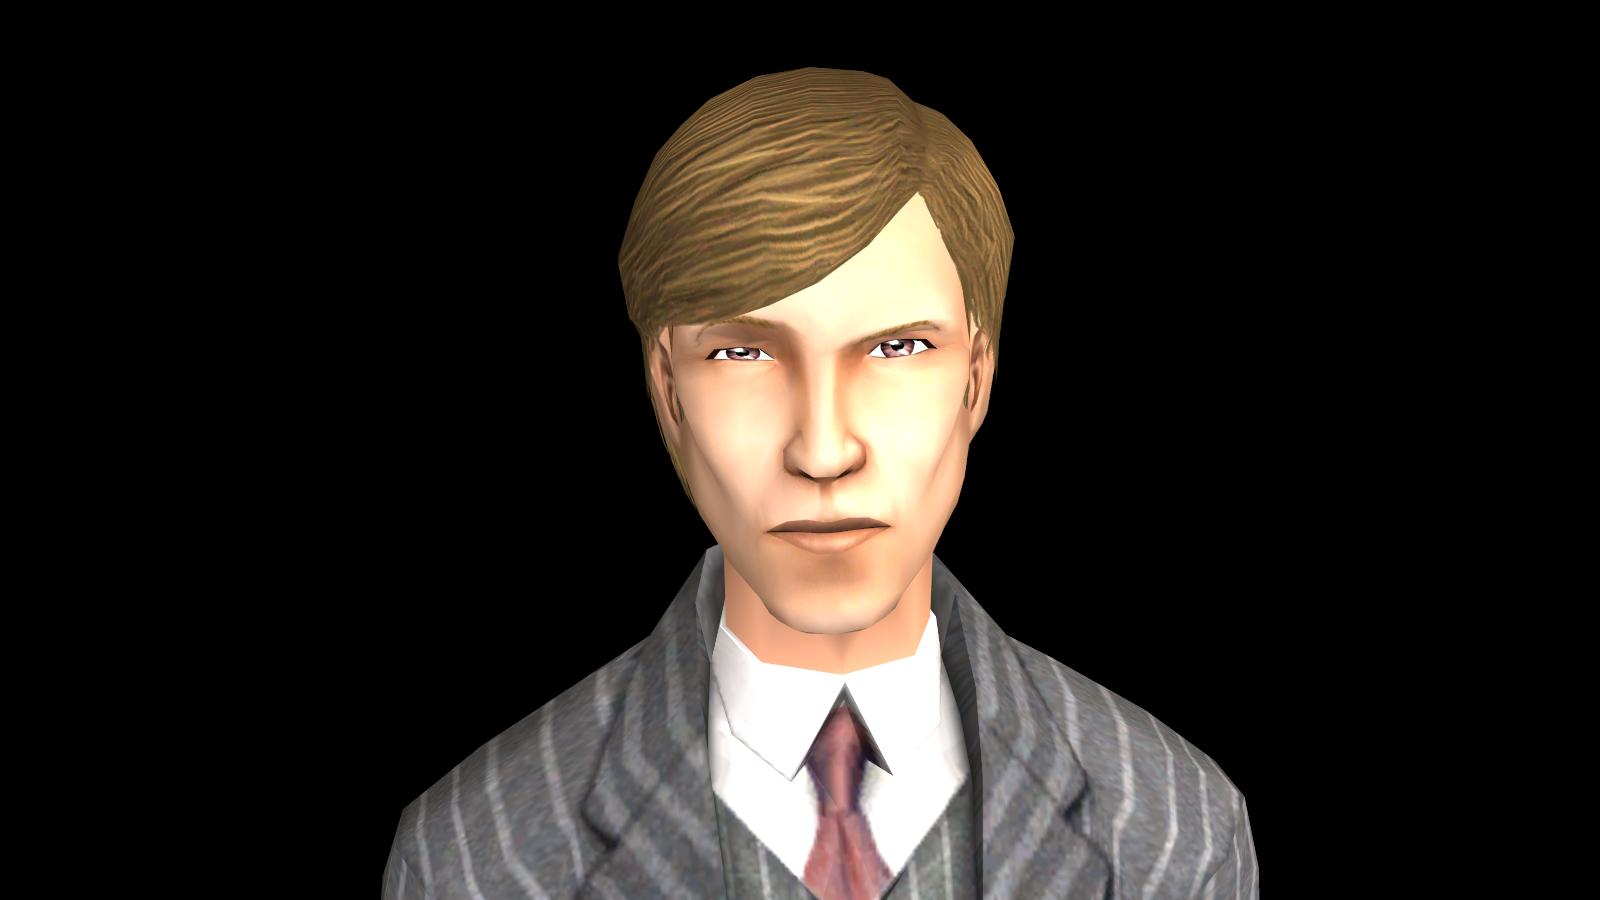 ModTheSims - Hannibal Lecter (Mads Mikkselen Edition)